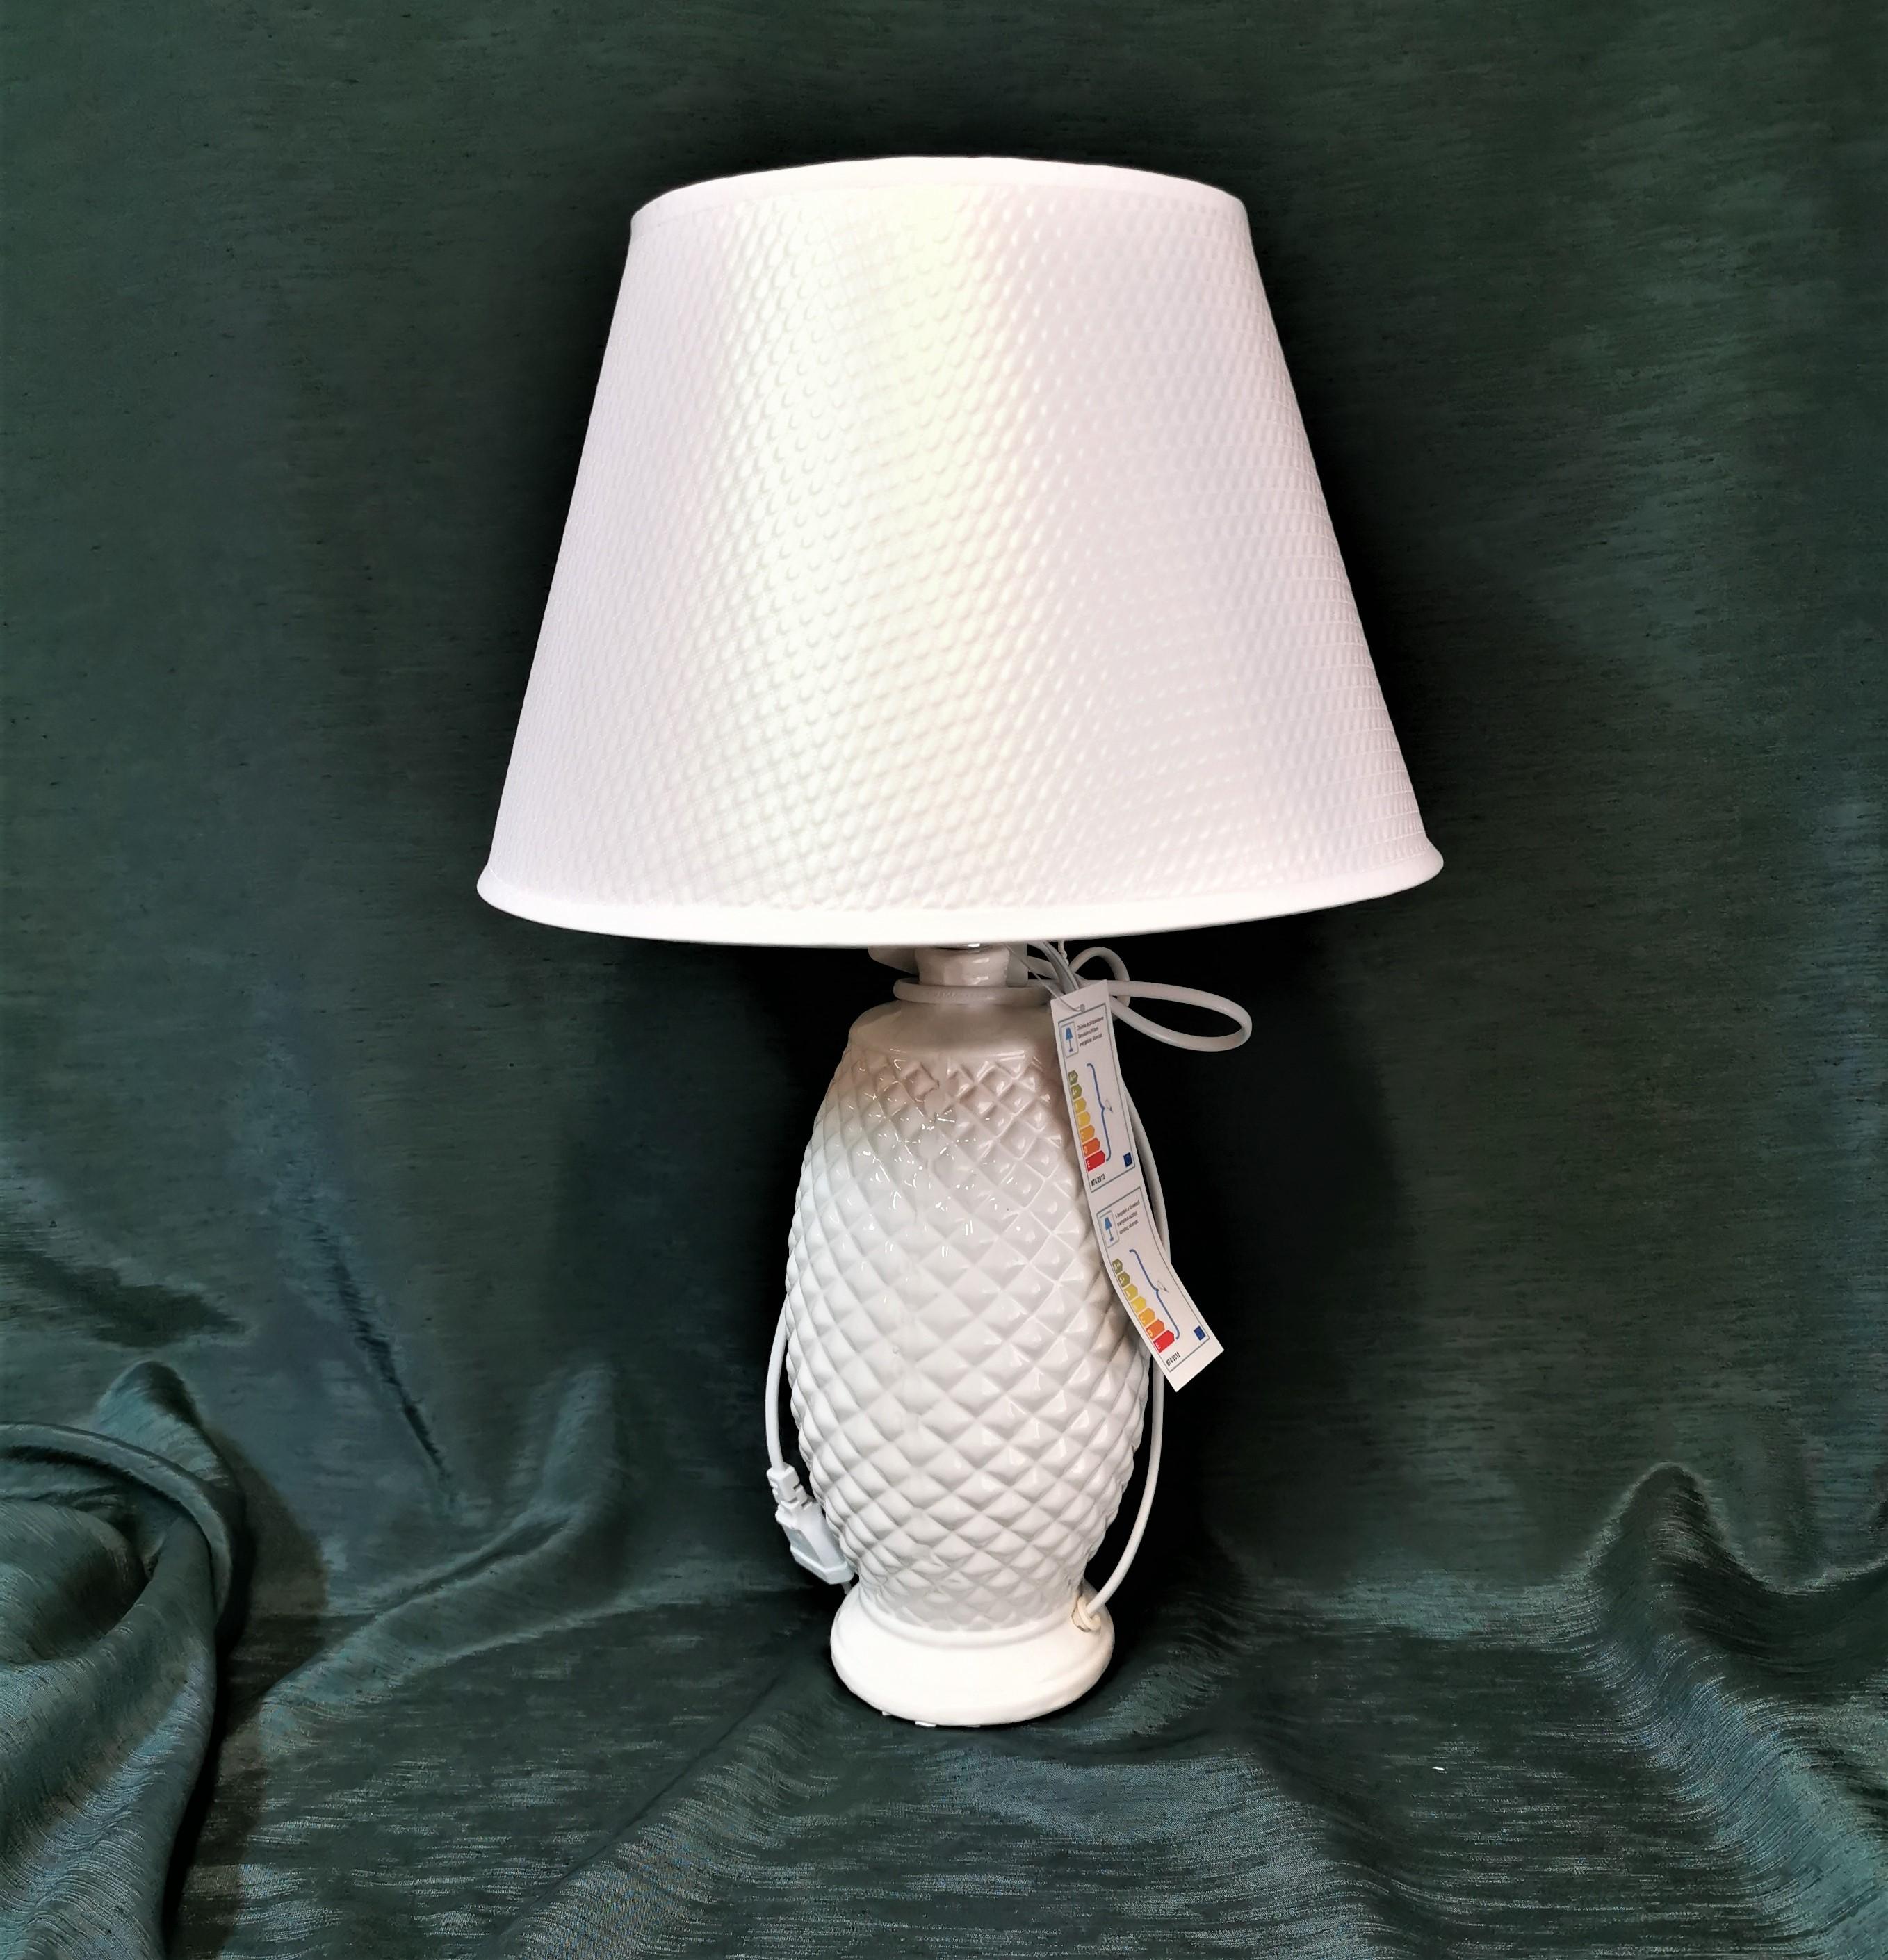 LAMPA Z KLOSZEM EL-10A194